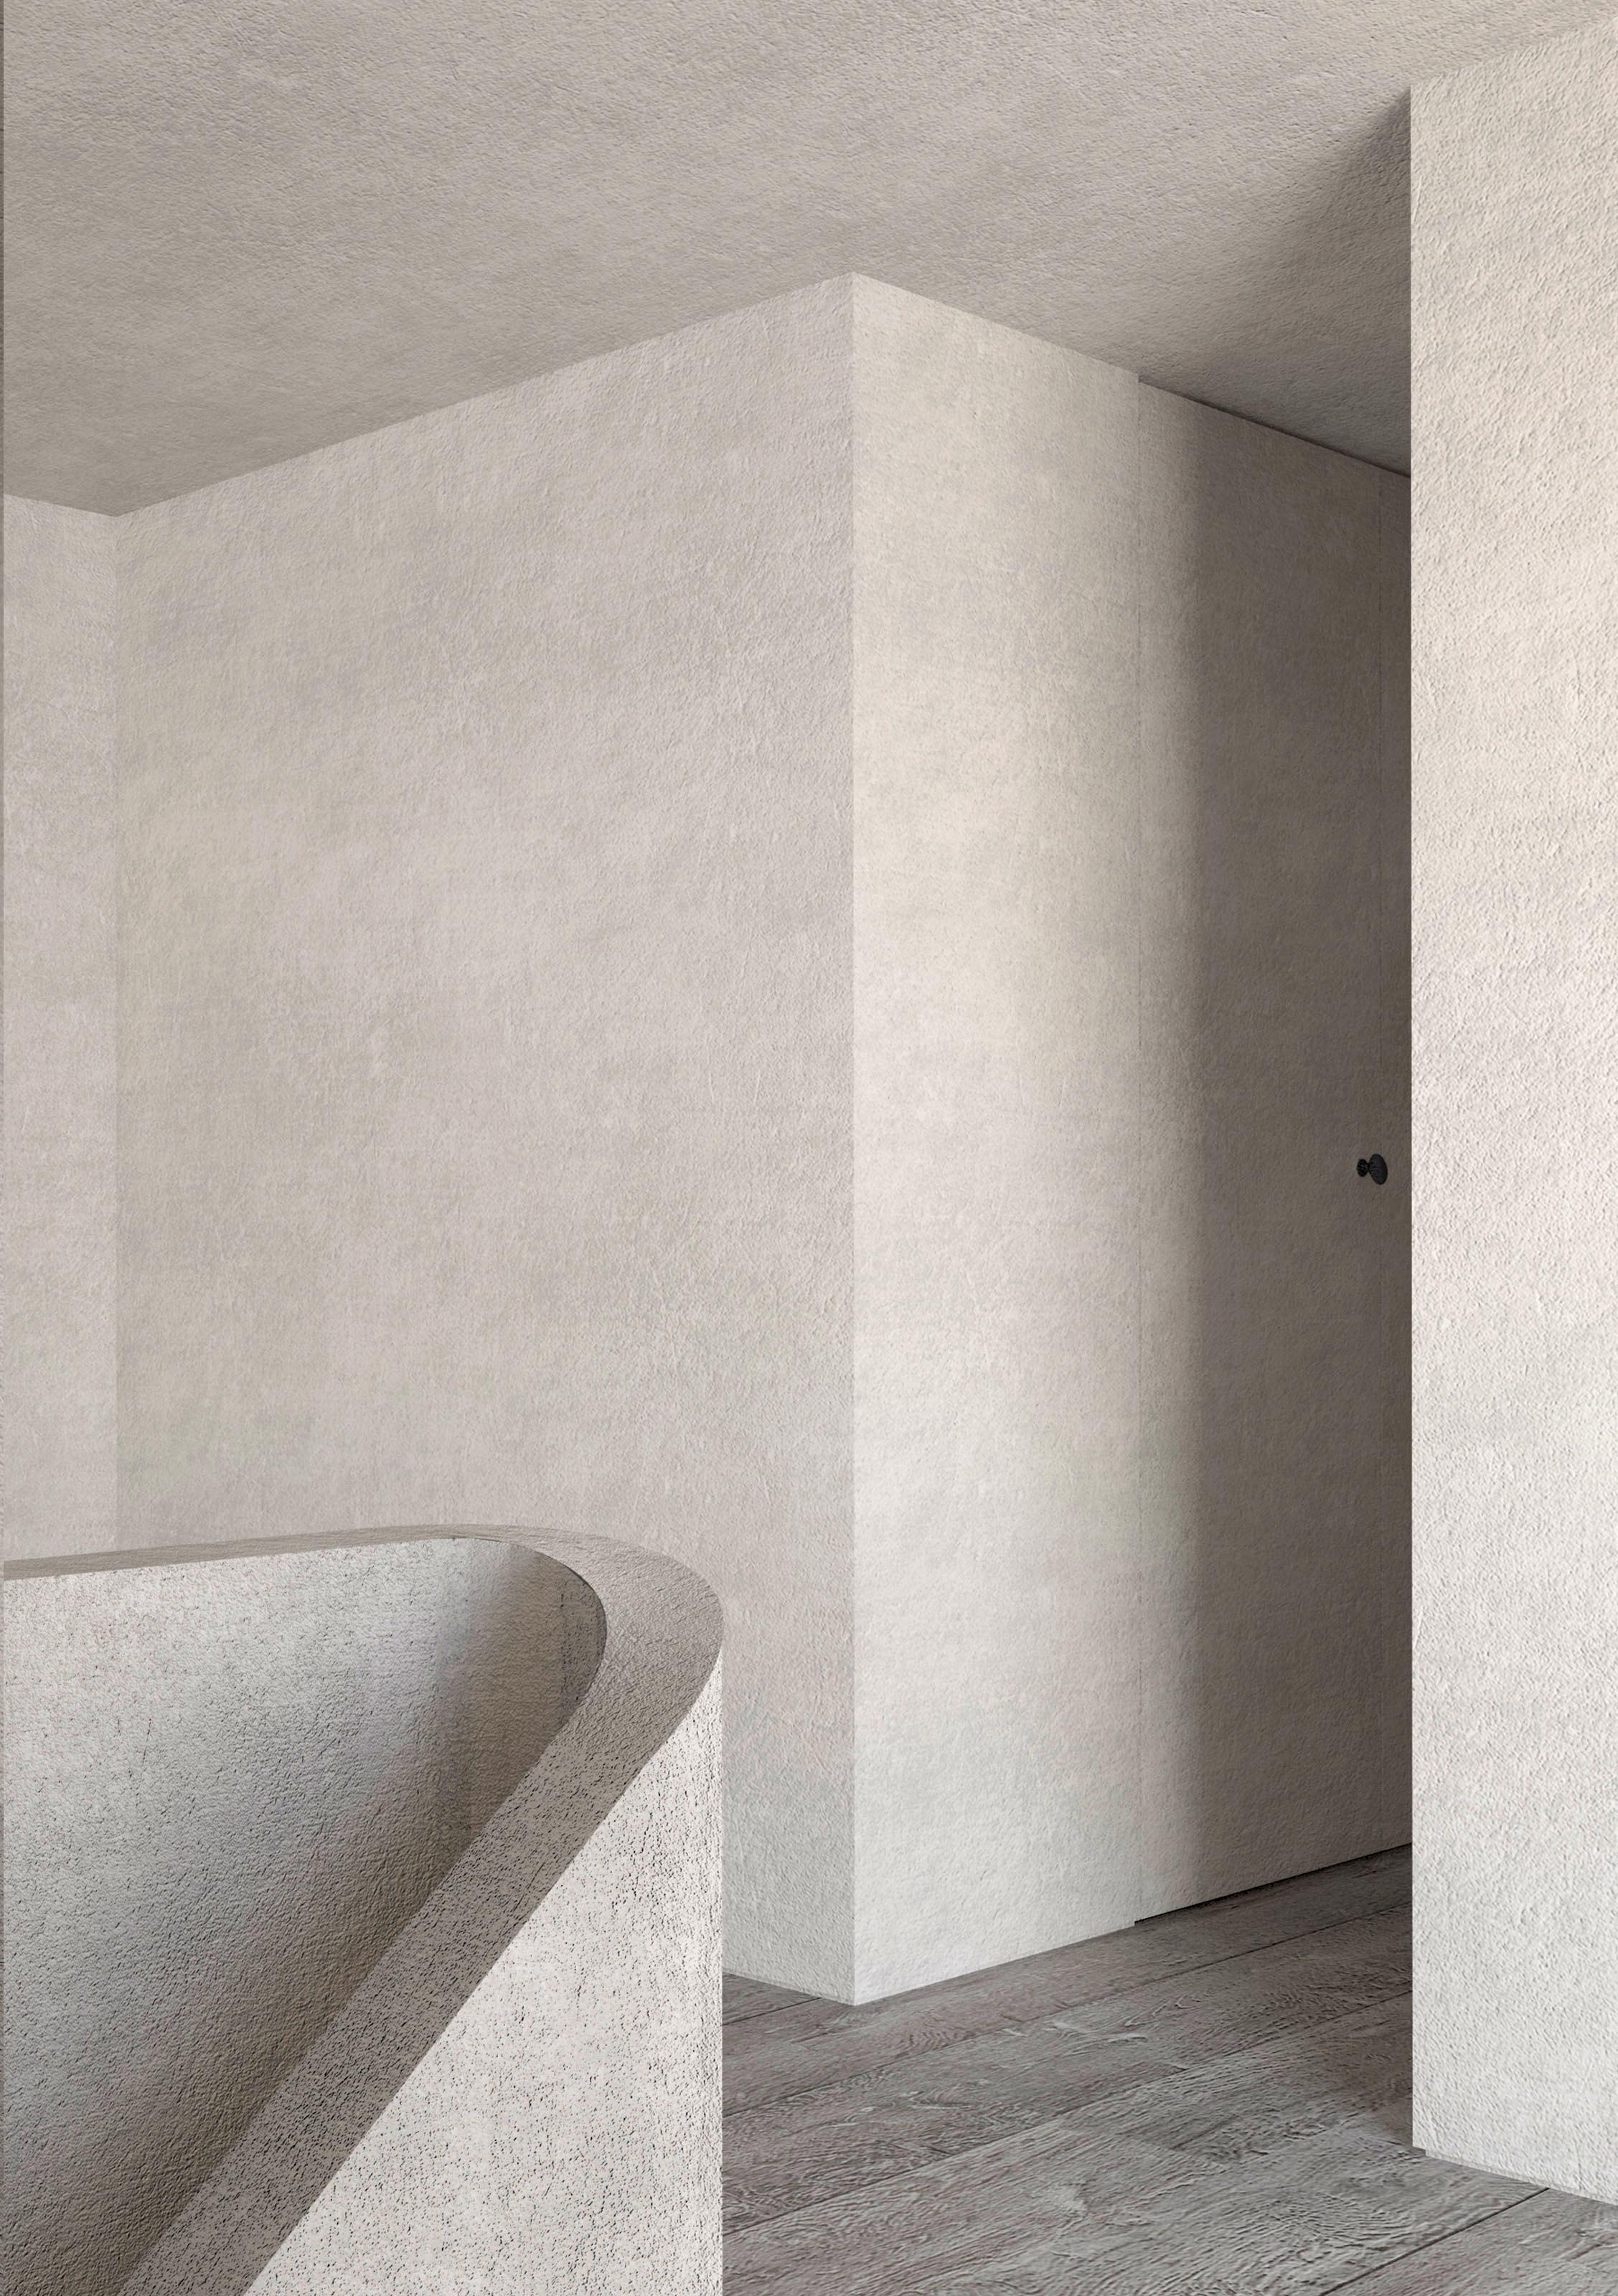 IA_Ivan_Oddos-Valeriane_Lazard-Grand_Veneur-Stairs-01.jpg